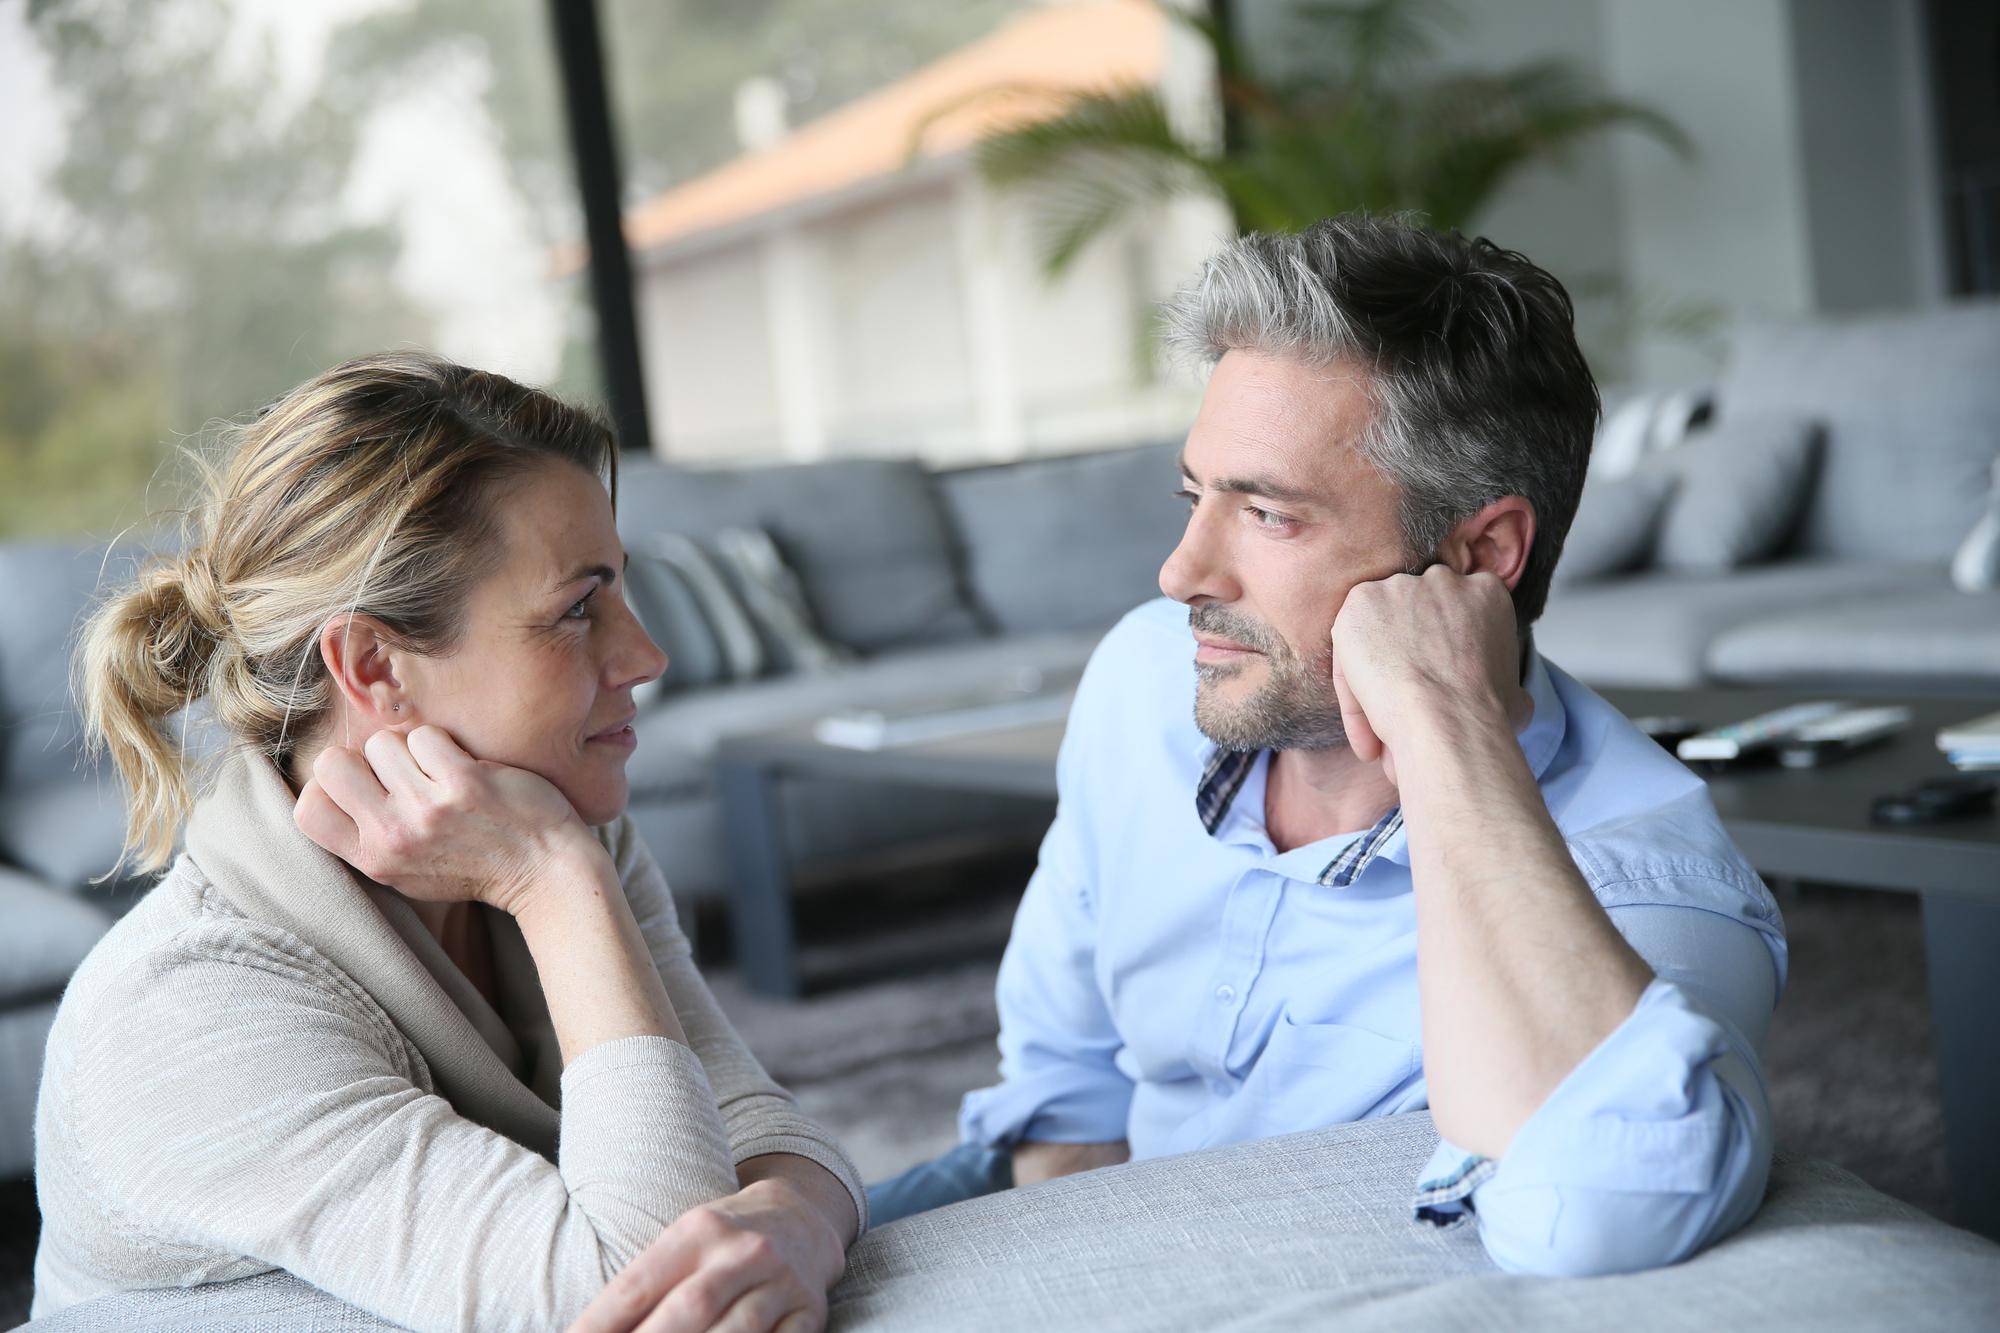 Couples_talking_kelly_chisholm.jpg